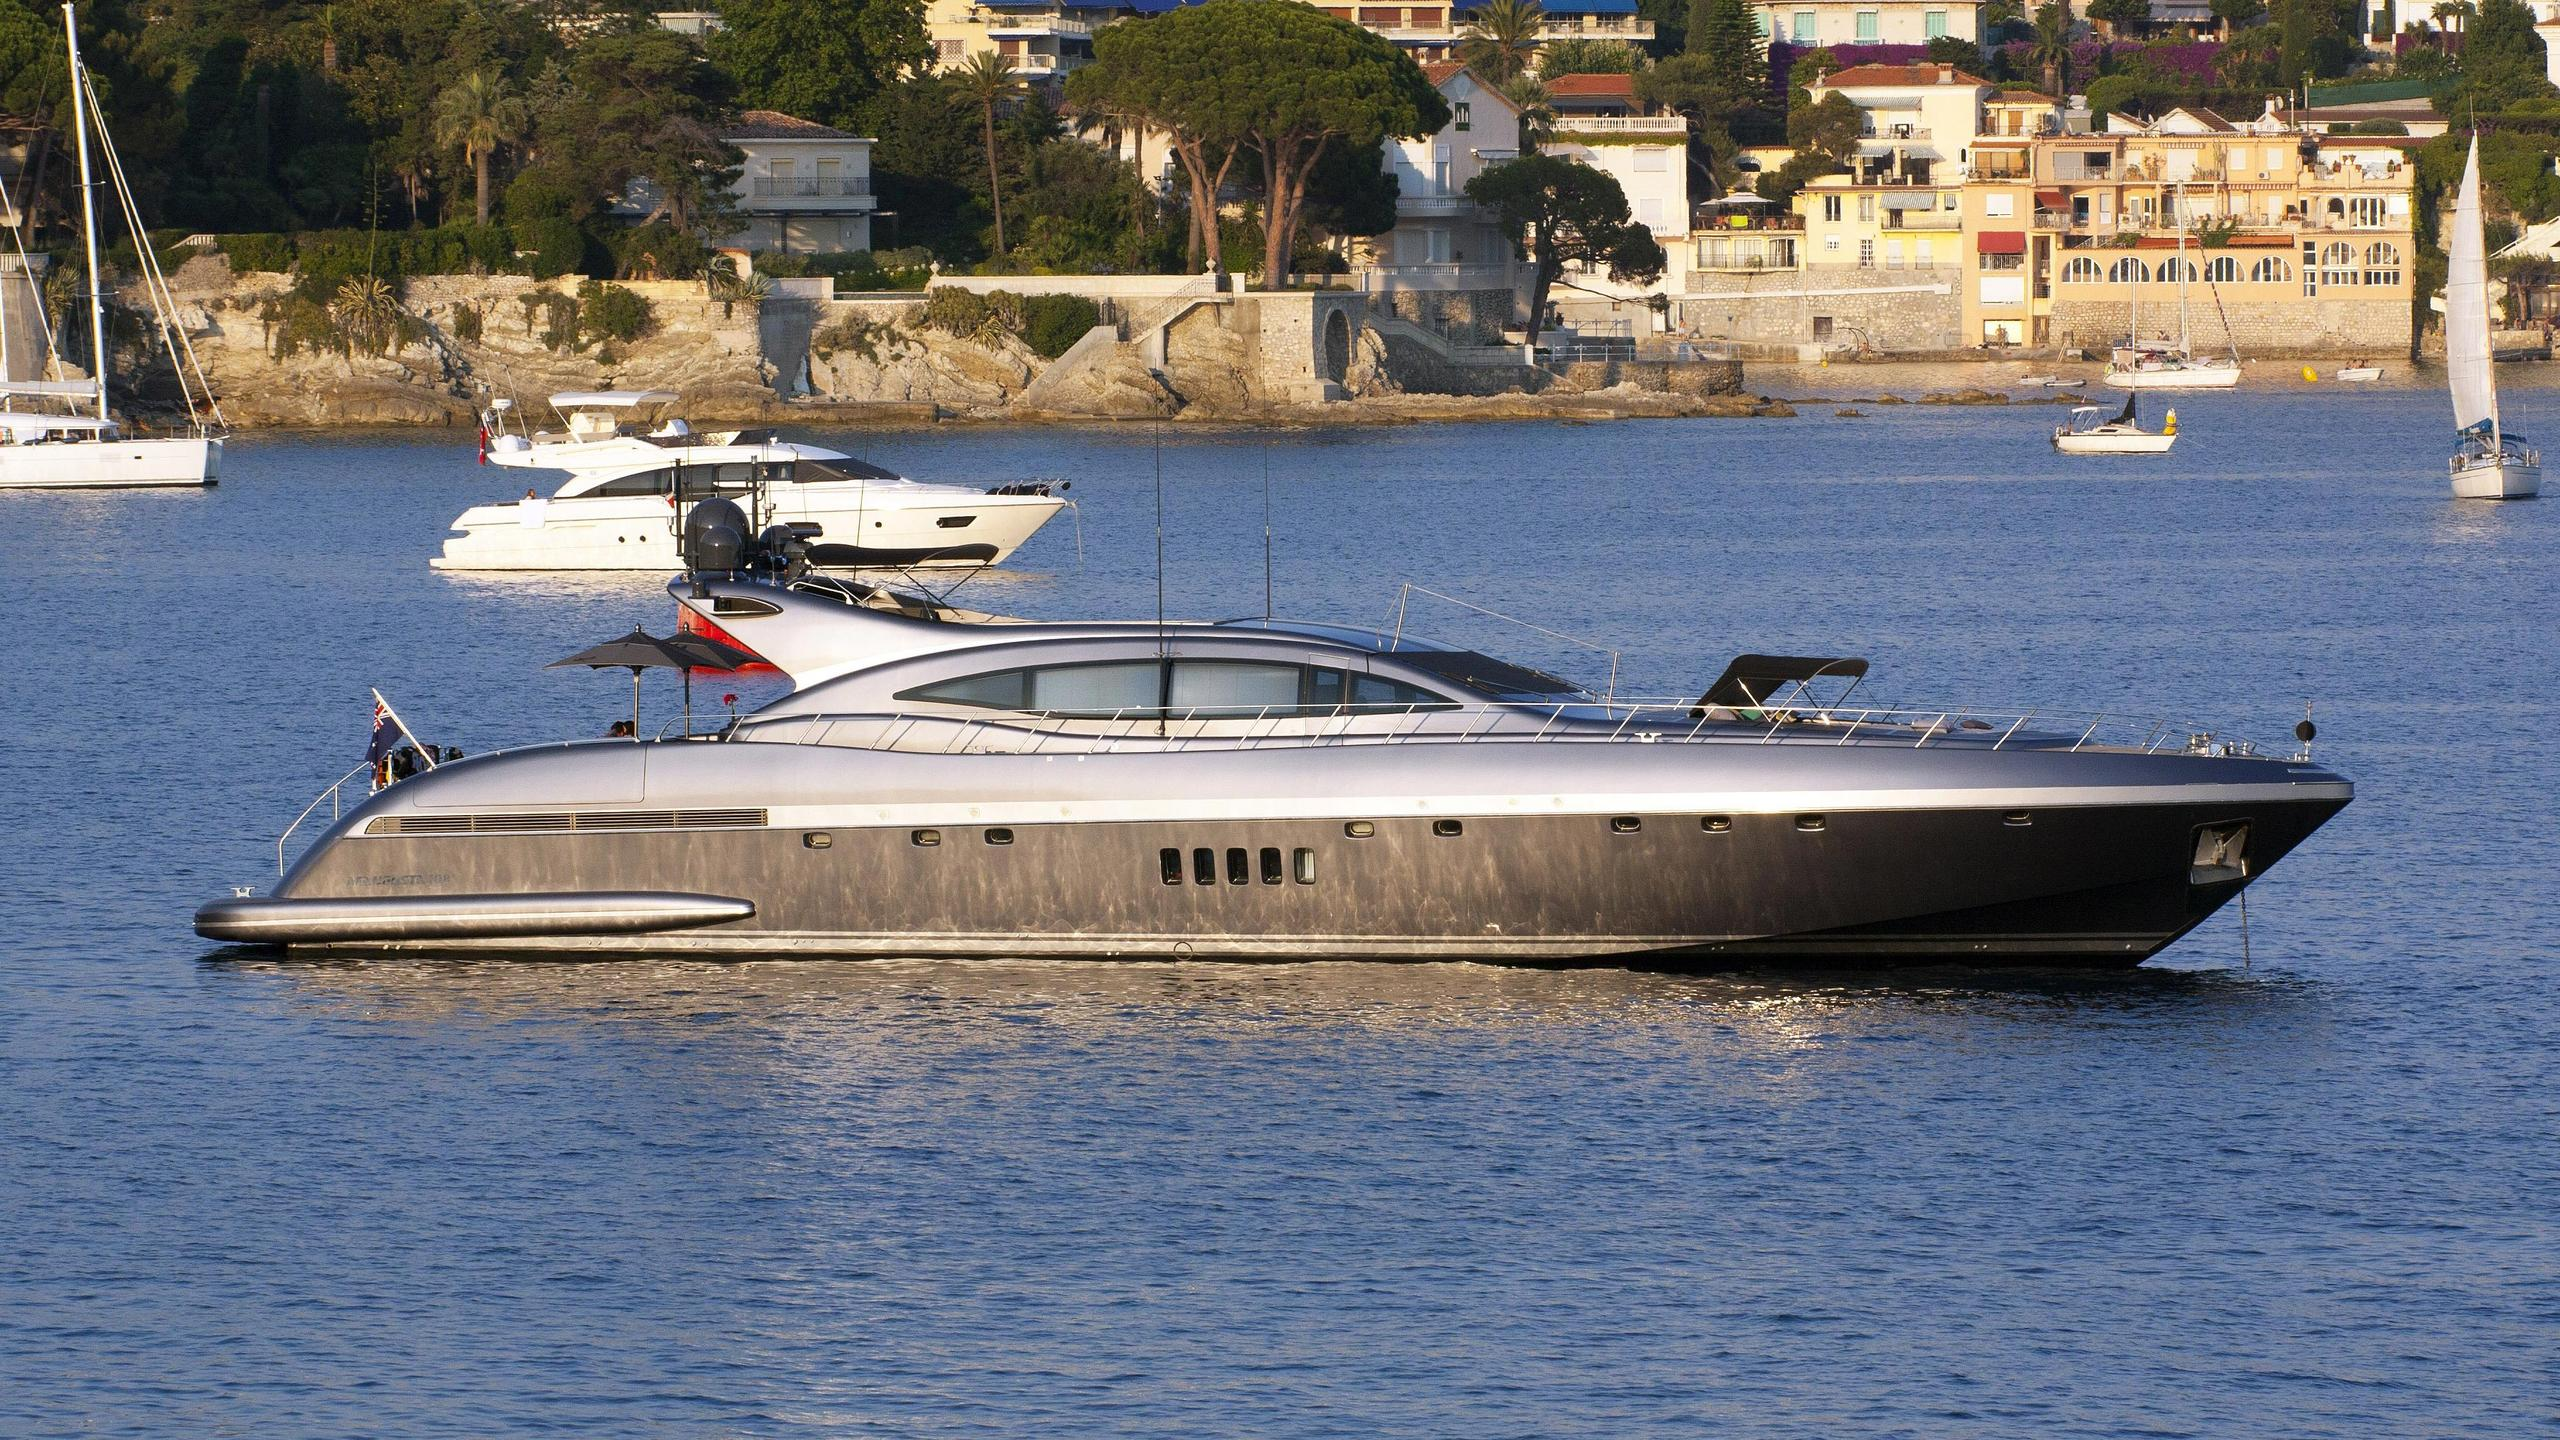 jff-motor-yacht-overmarine-mangusta-108-sport-2001-33m-profile